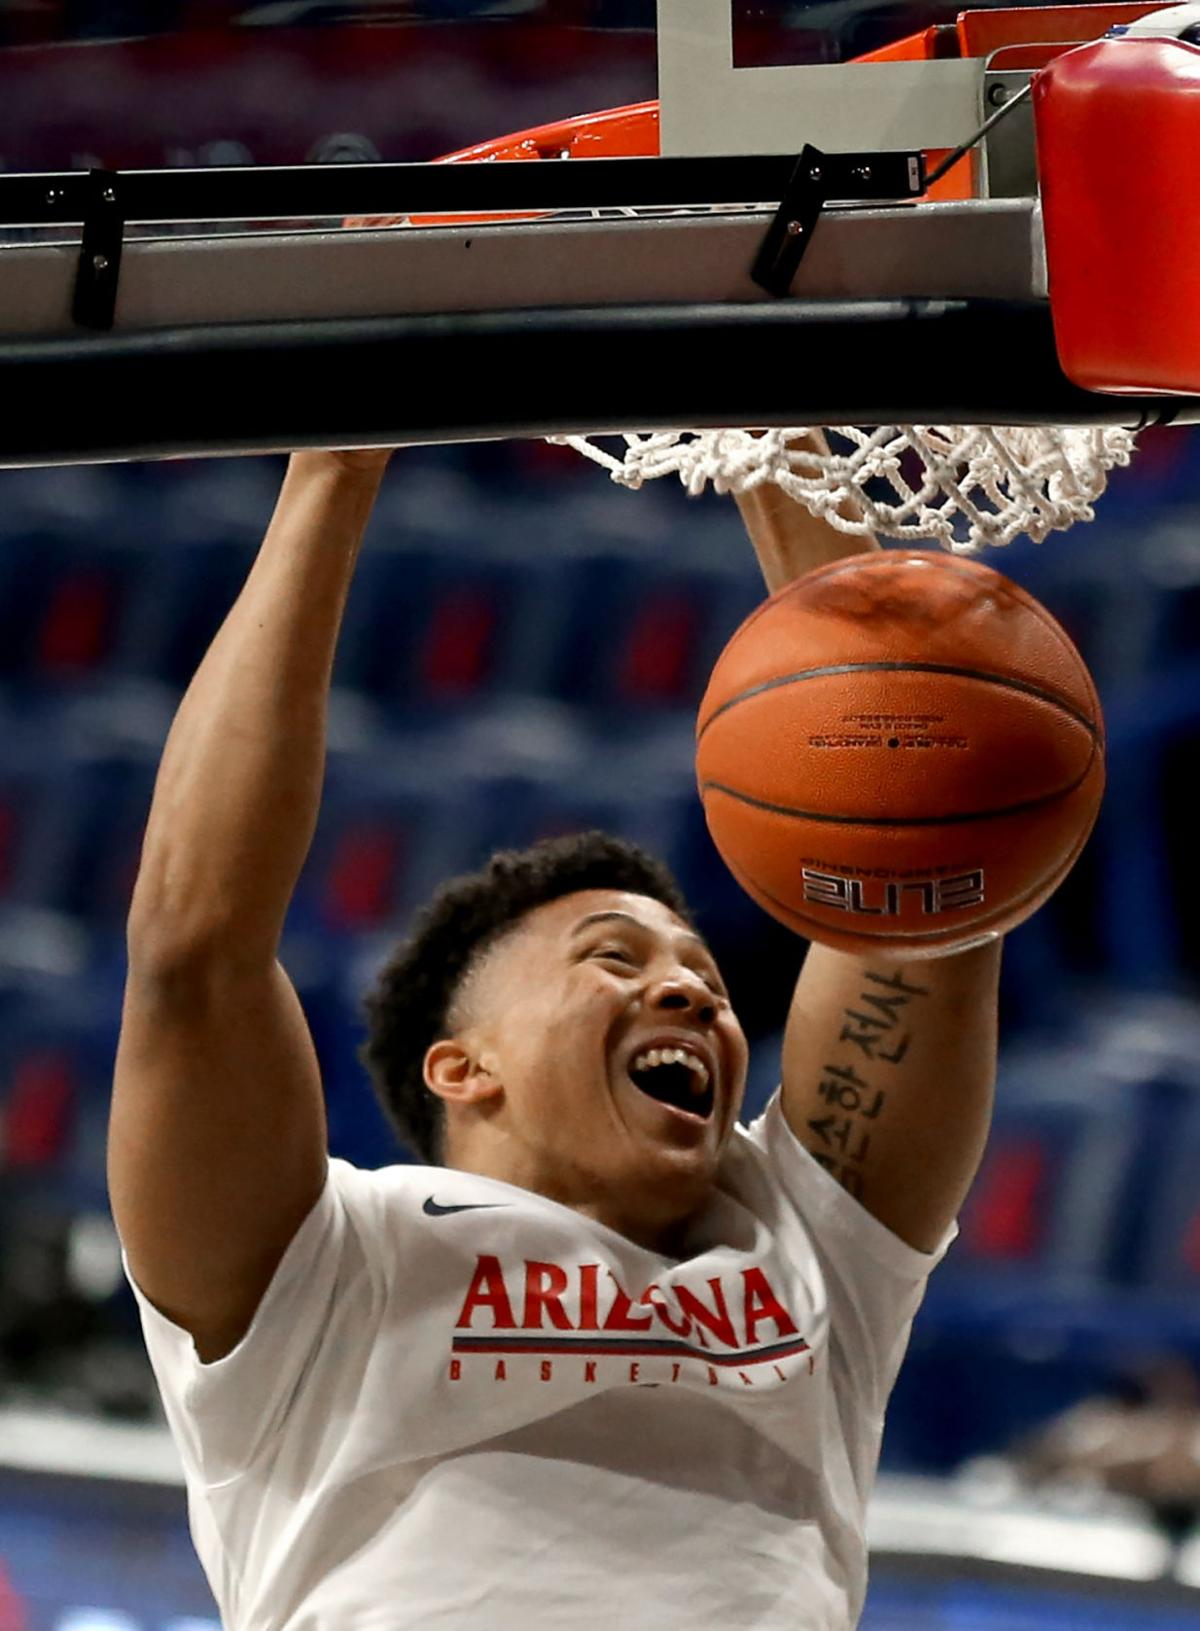 Arizona Wildcats take 38-27 halftime lead over Oregon State